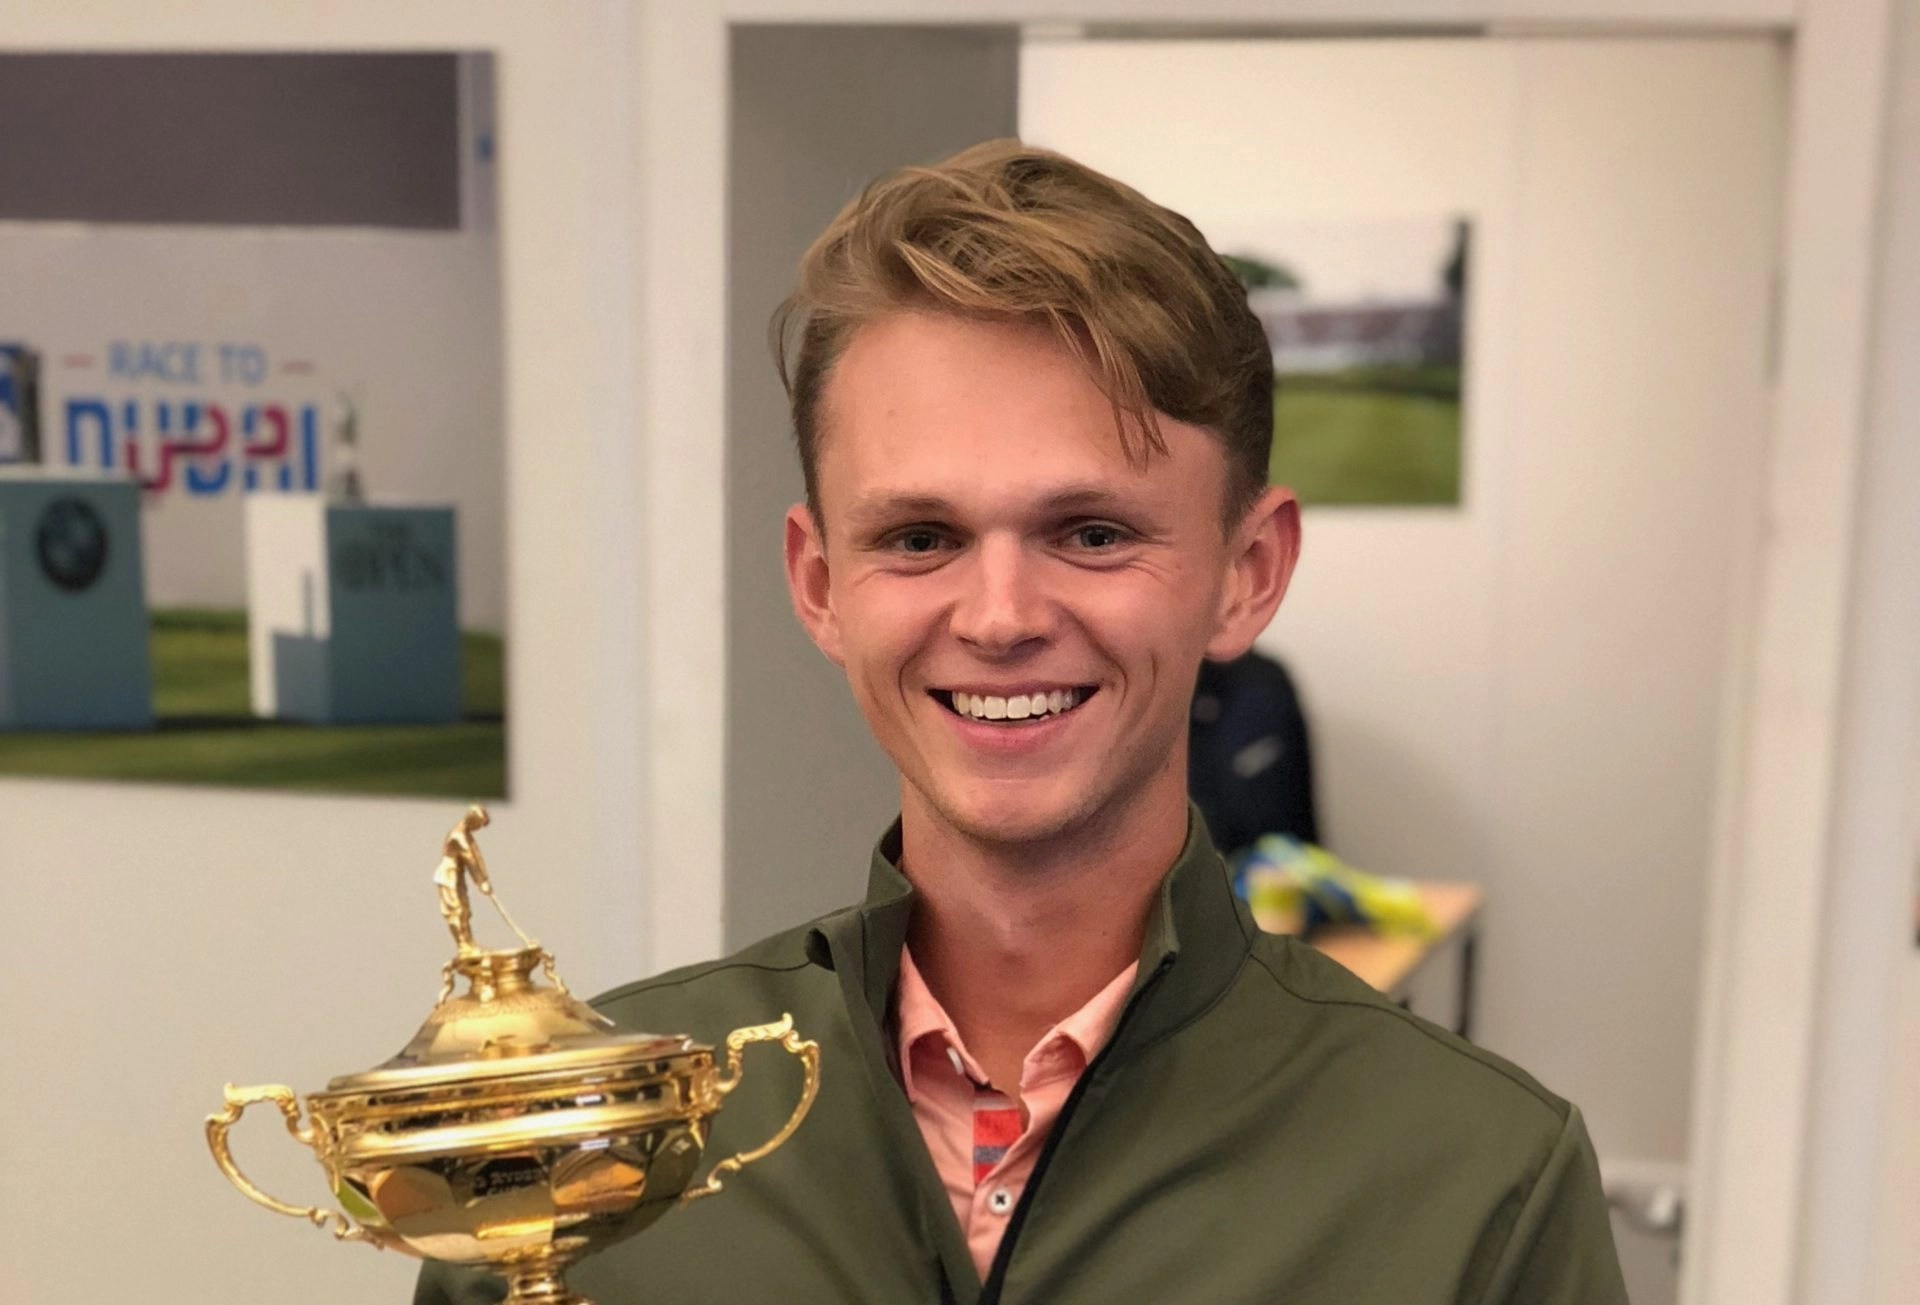 Chase McCarthy | Partnership Management Coordinator at the PGA European Tour